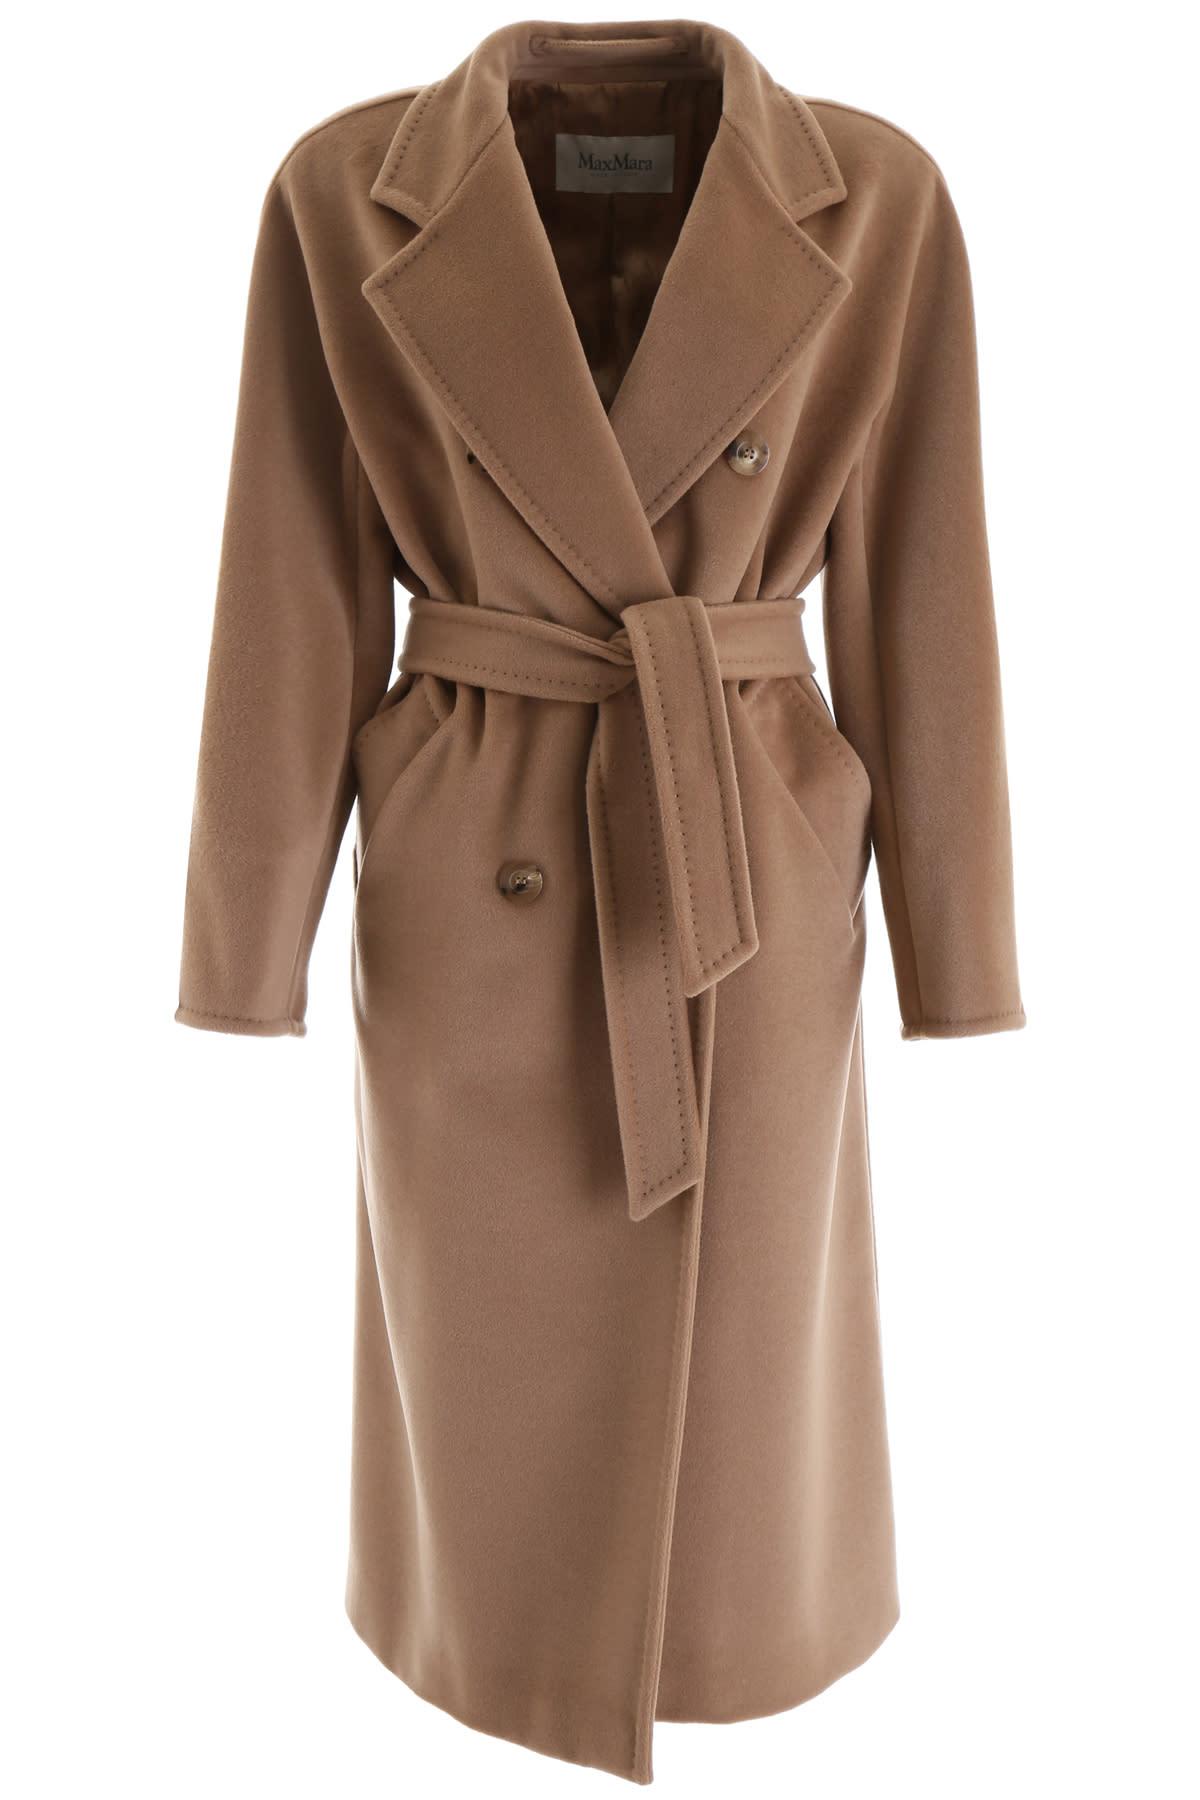 Max Mara Madame Double-breasted Coat